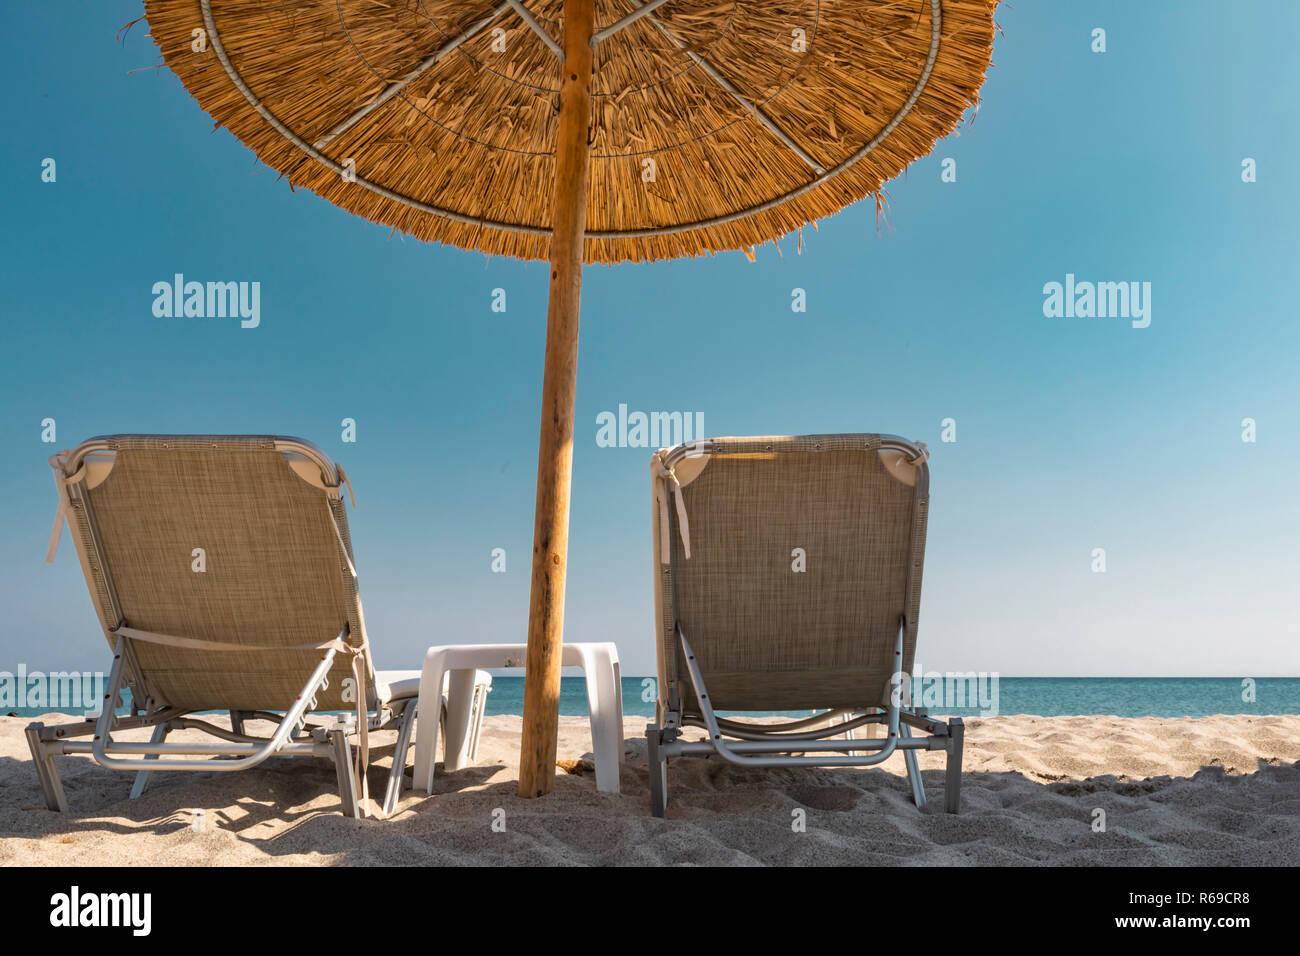 Remarkable Pair Beach Lounge Chairs Umbrella Stock Photos Pair Beach Inzonedesignstudio Interior Chair Design Inzonedesignstudiocom